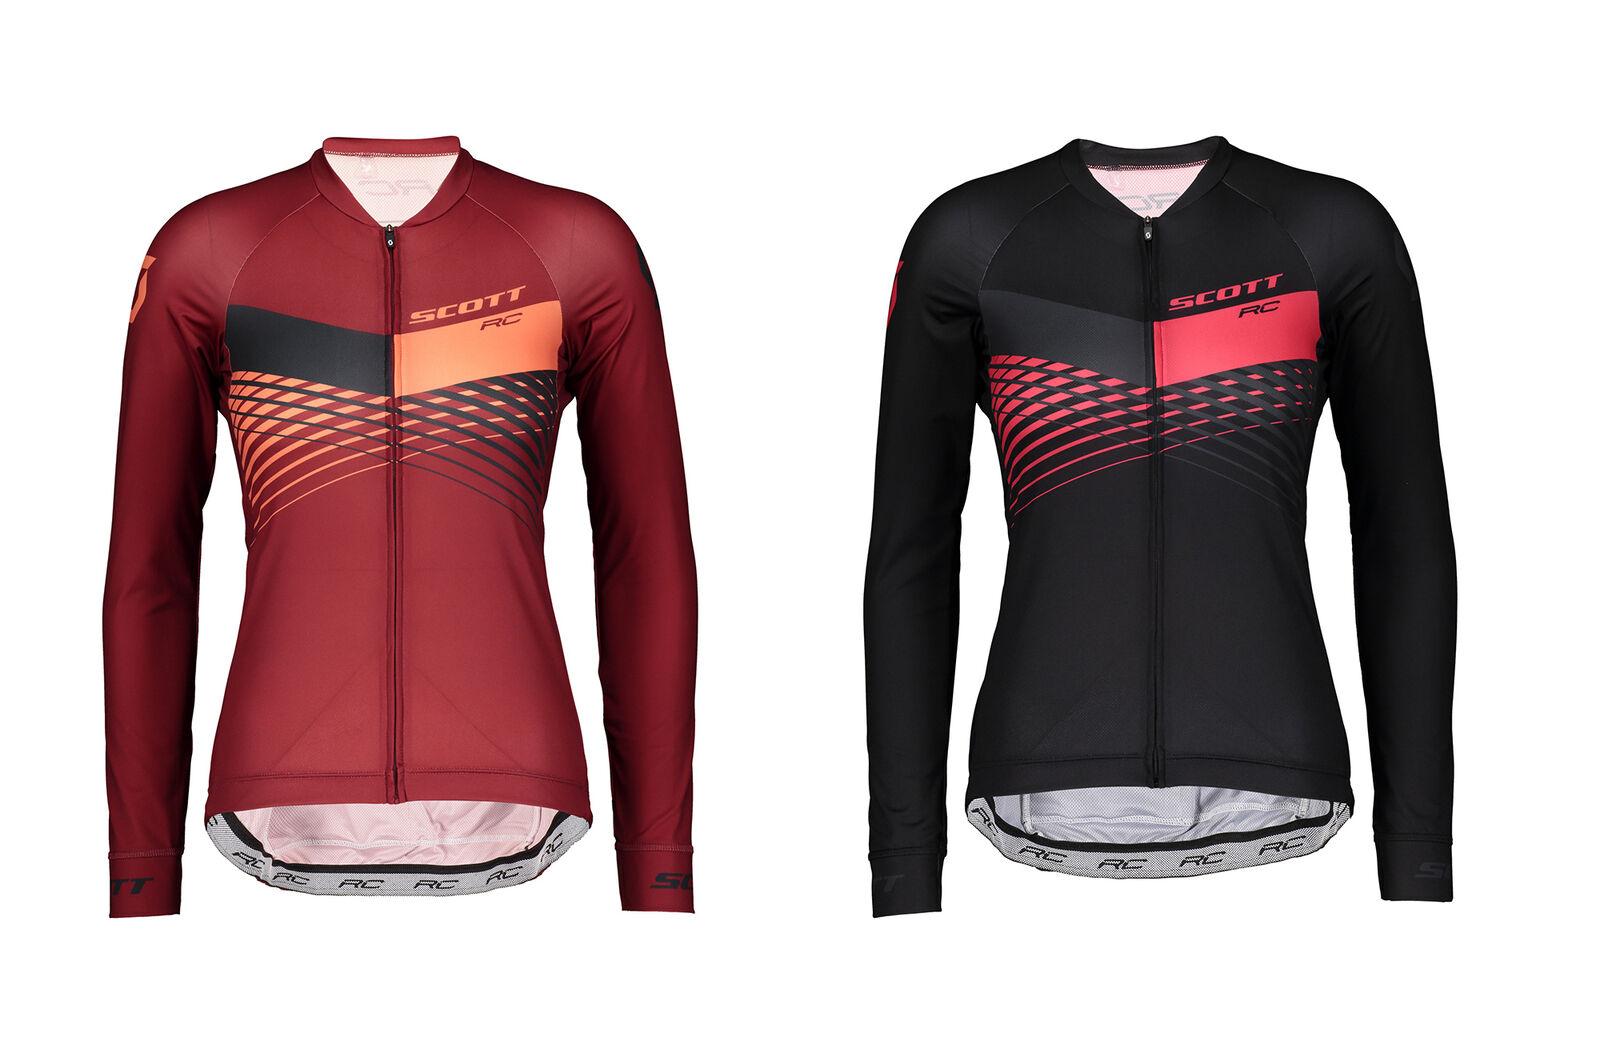 Scott RC pro Manga Larga Camiseta Mujer Malleta de Bicicleta  Culotte Camisa  garantizado